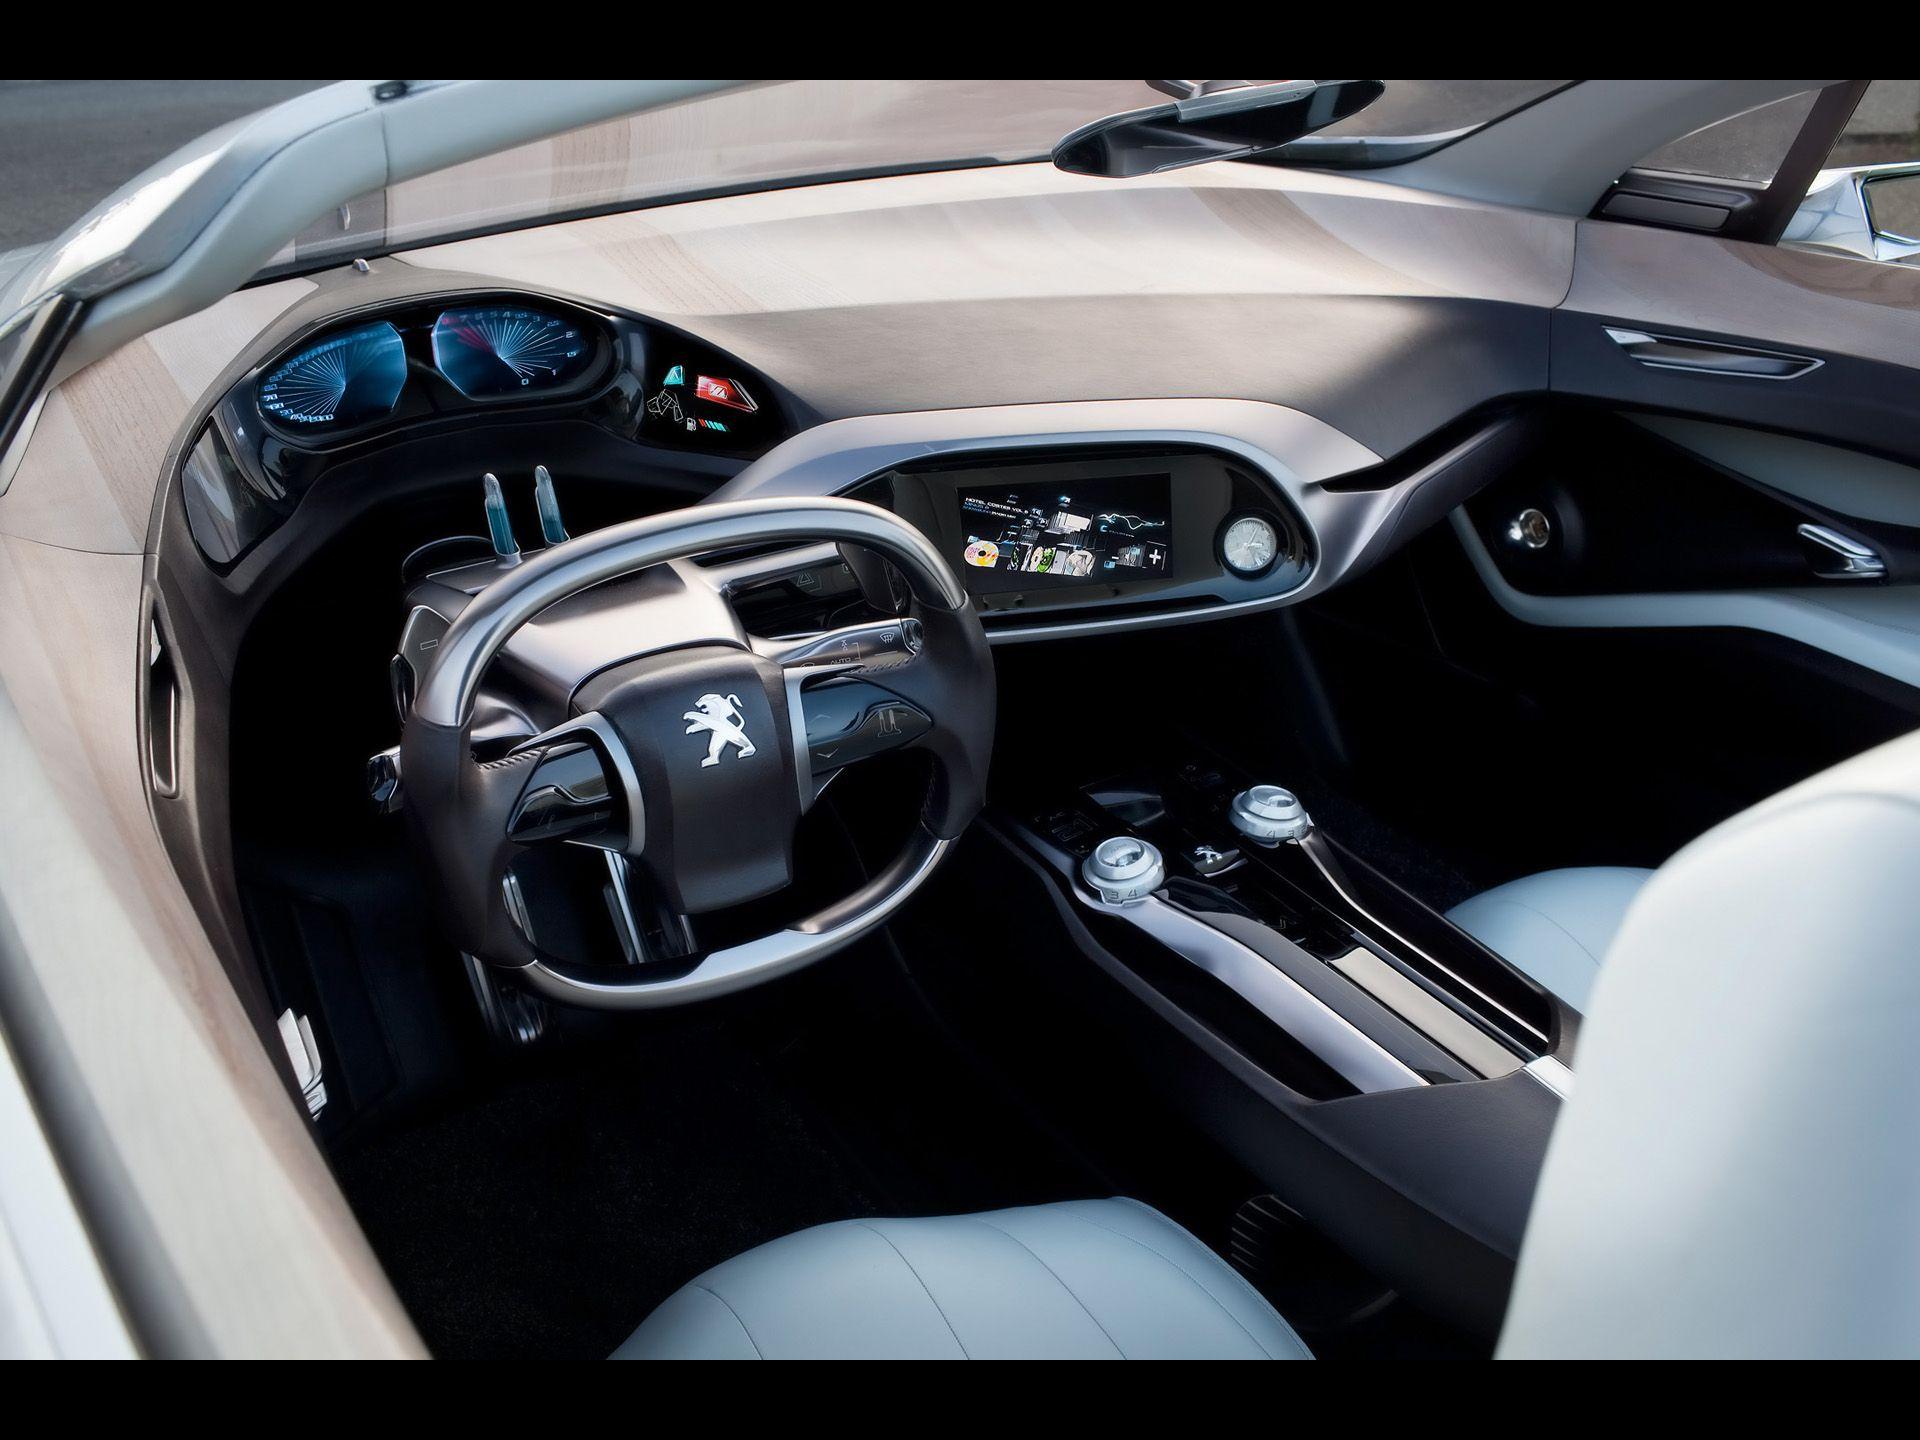 Car interior photos - 2010 Peugeot Sr1 Concept Car Interior 1920x1440 Jpg